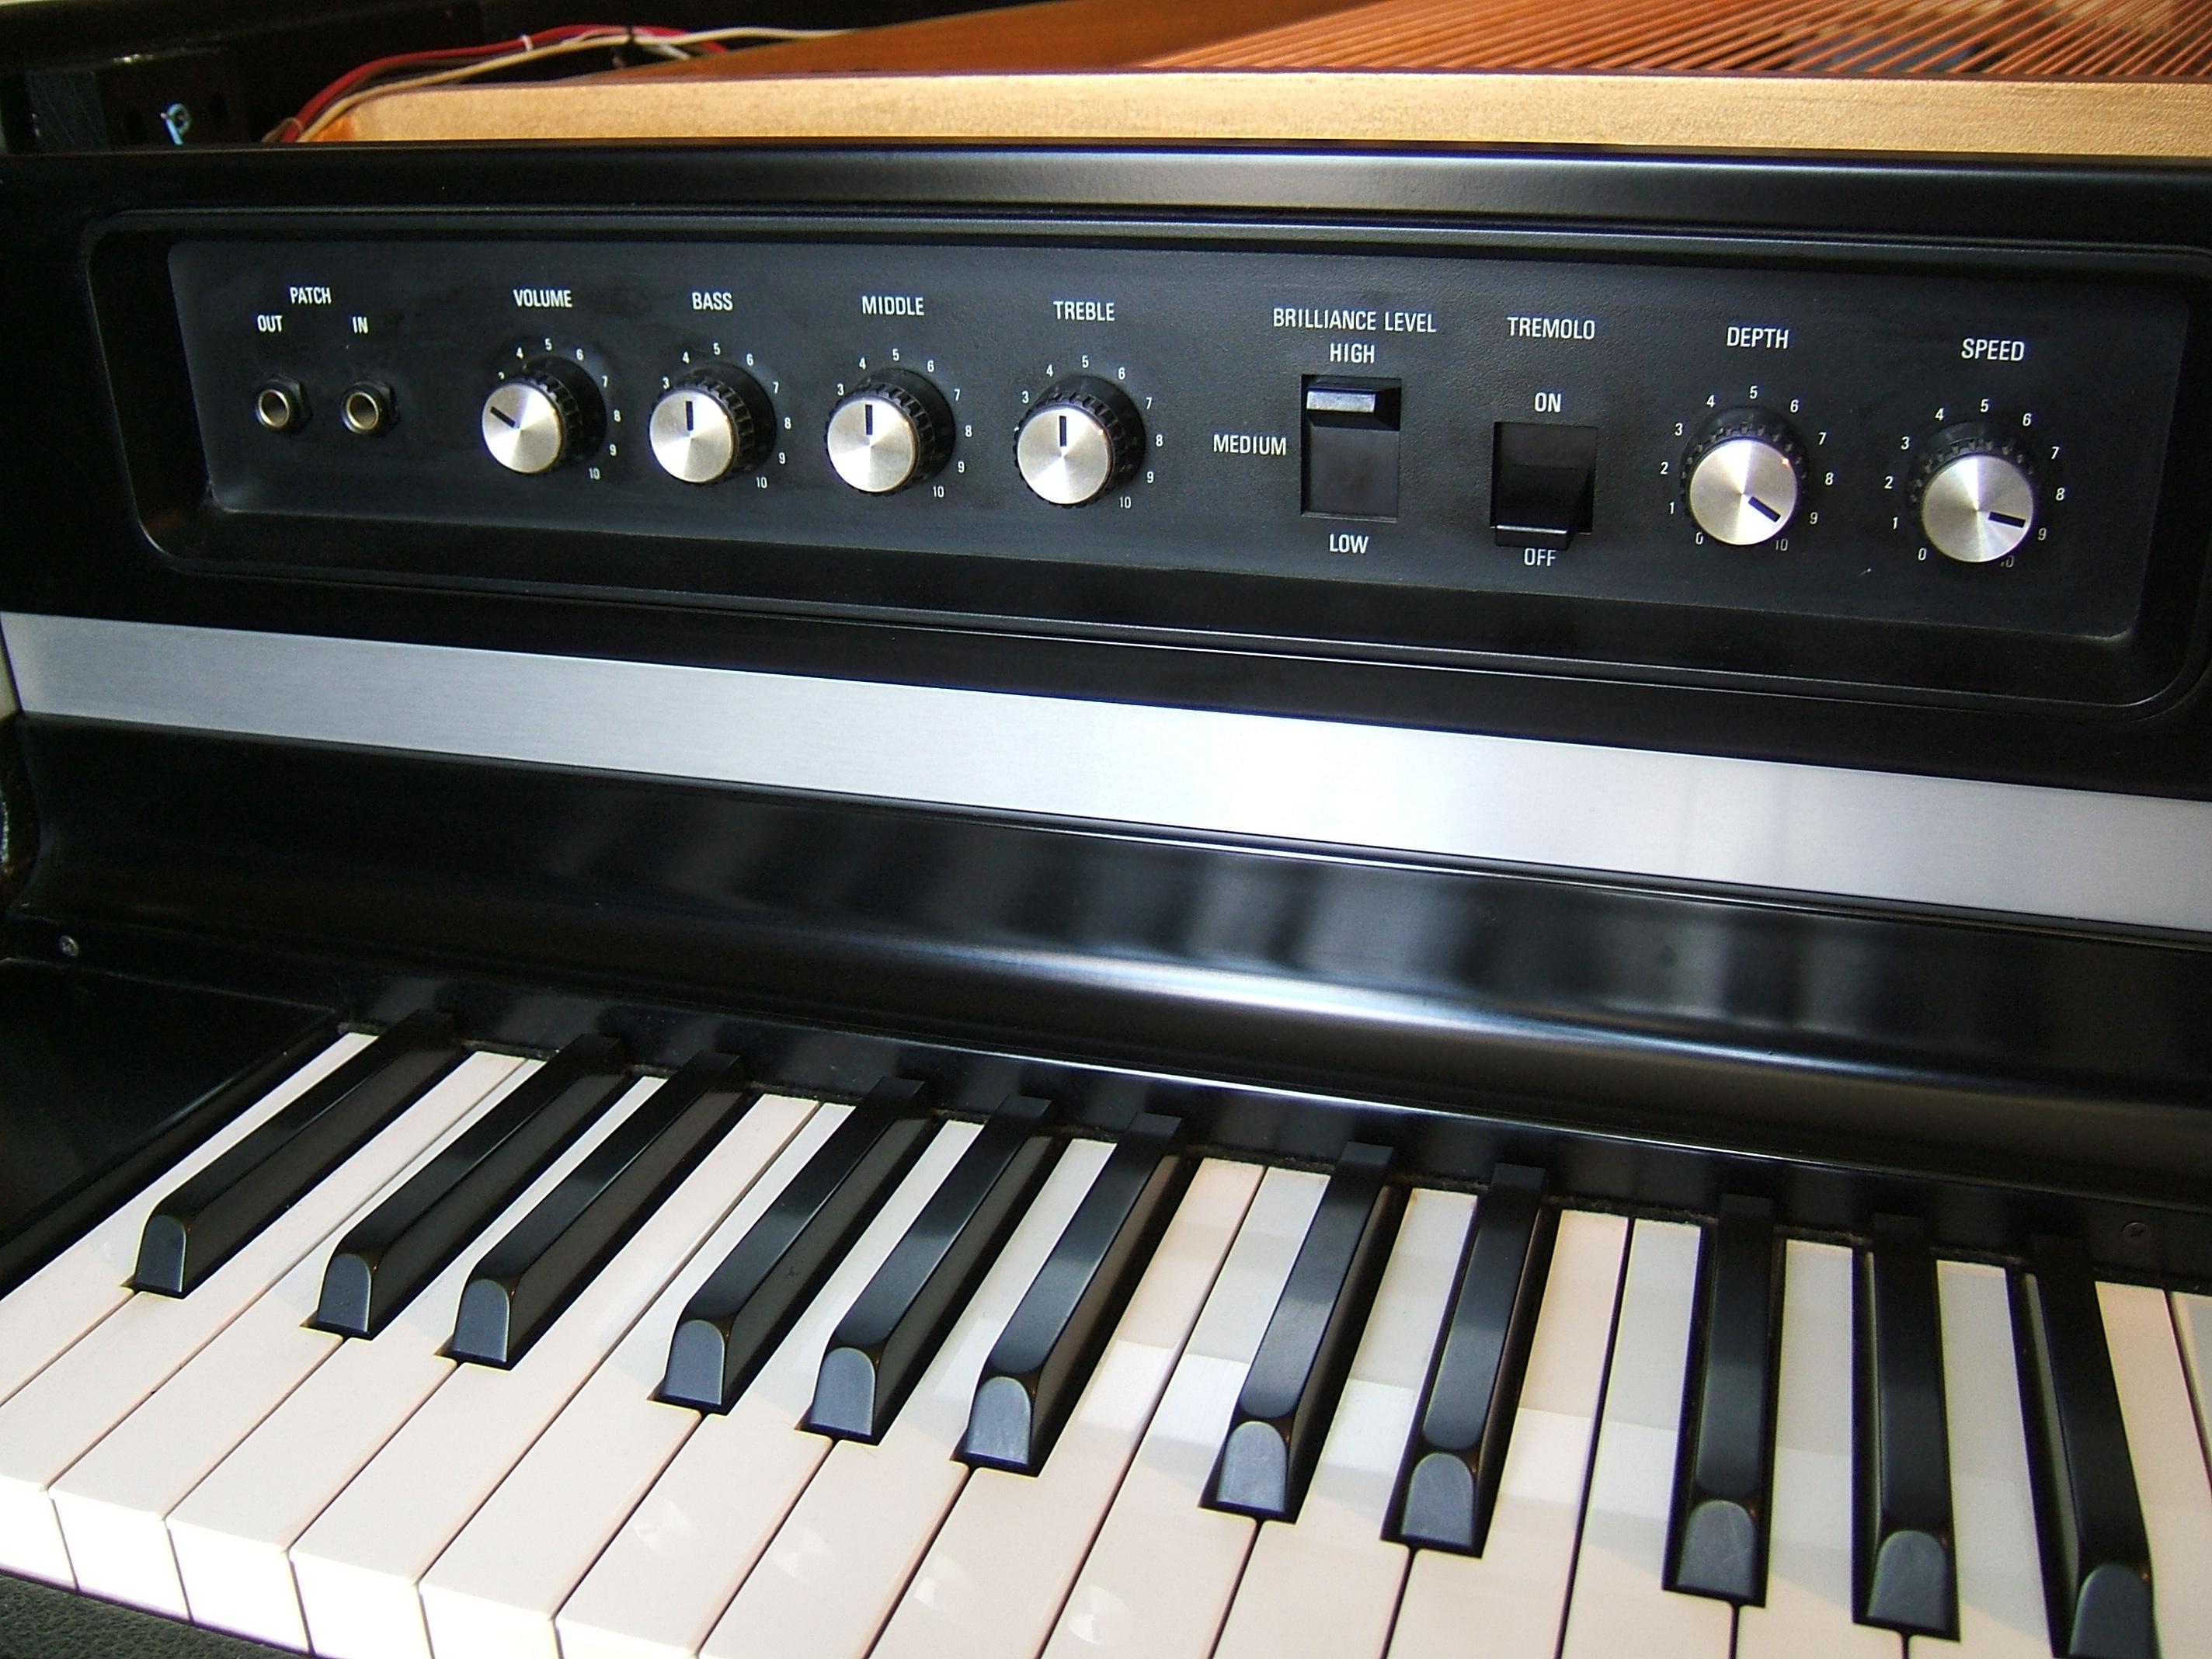 yamaha cp 80 image 428244 audiofanzine rh en audiofanzine com Vintage Yamaha Keyboard Yamaha Instruments